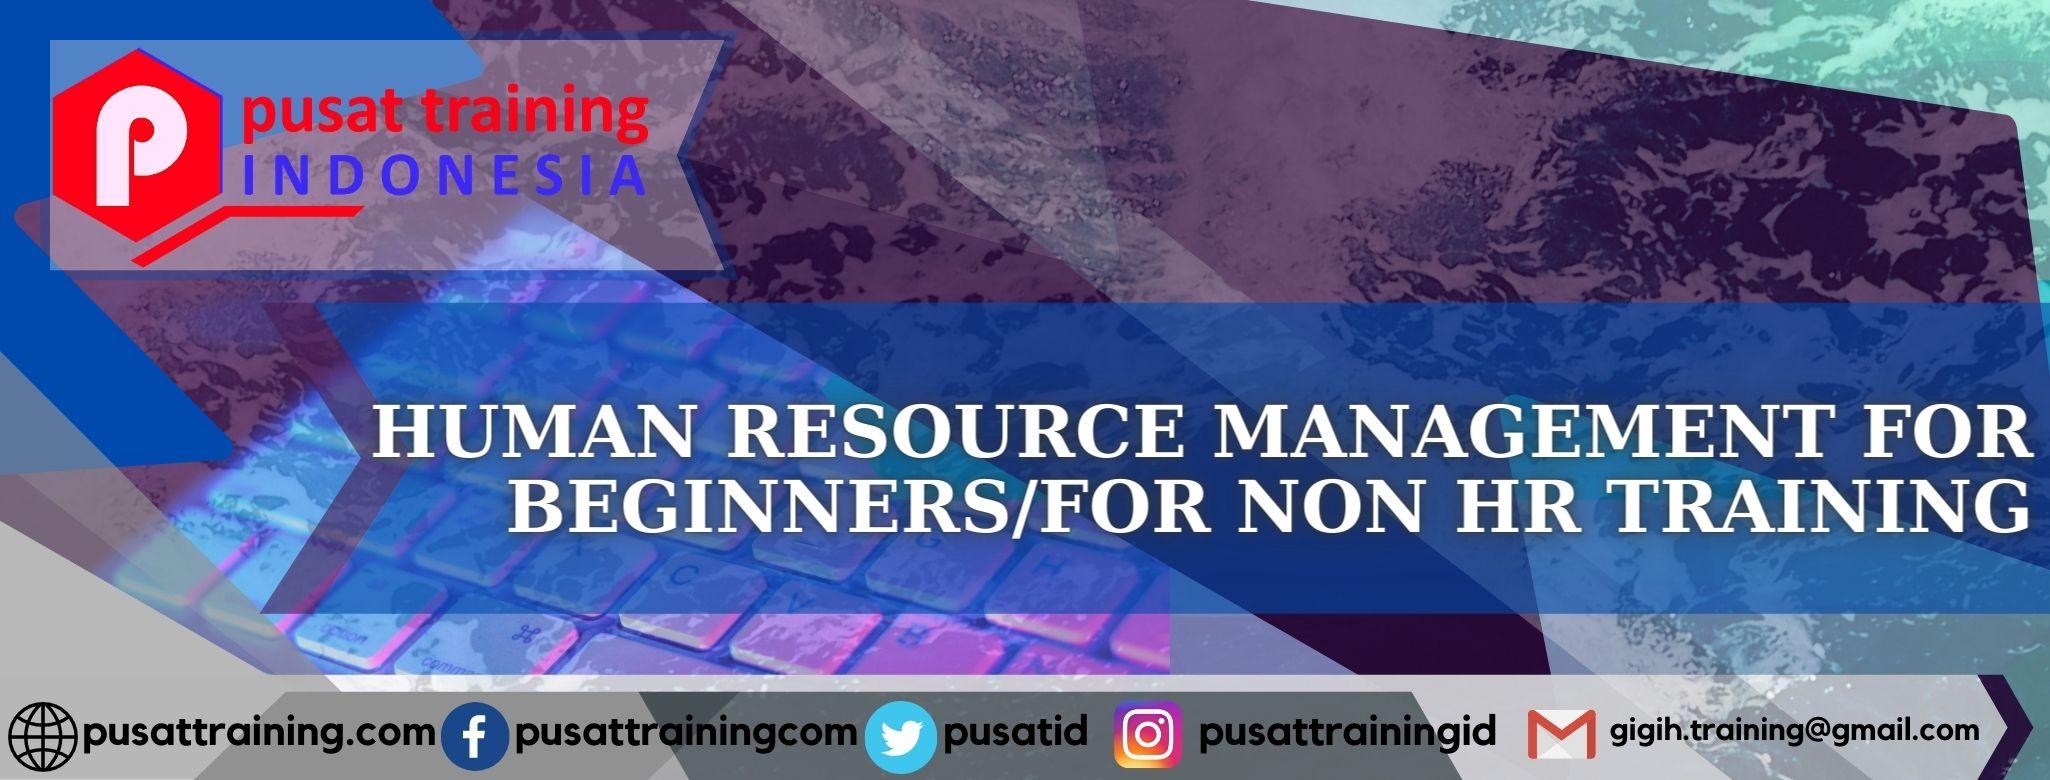 human-resource-management-for-beginnersfor-non-hr